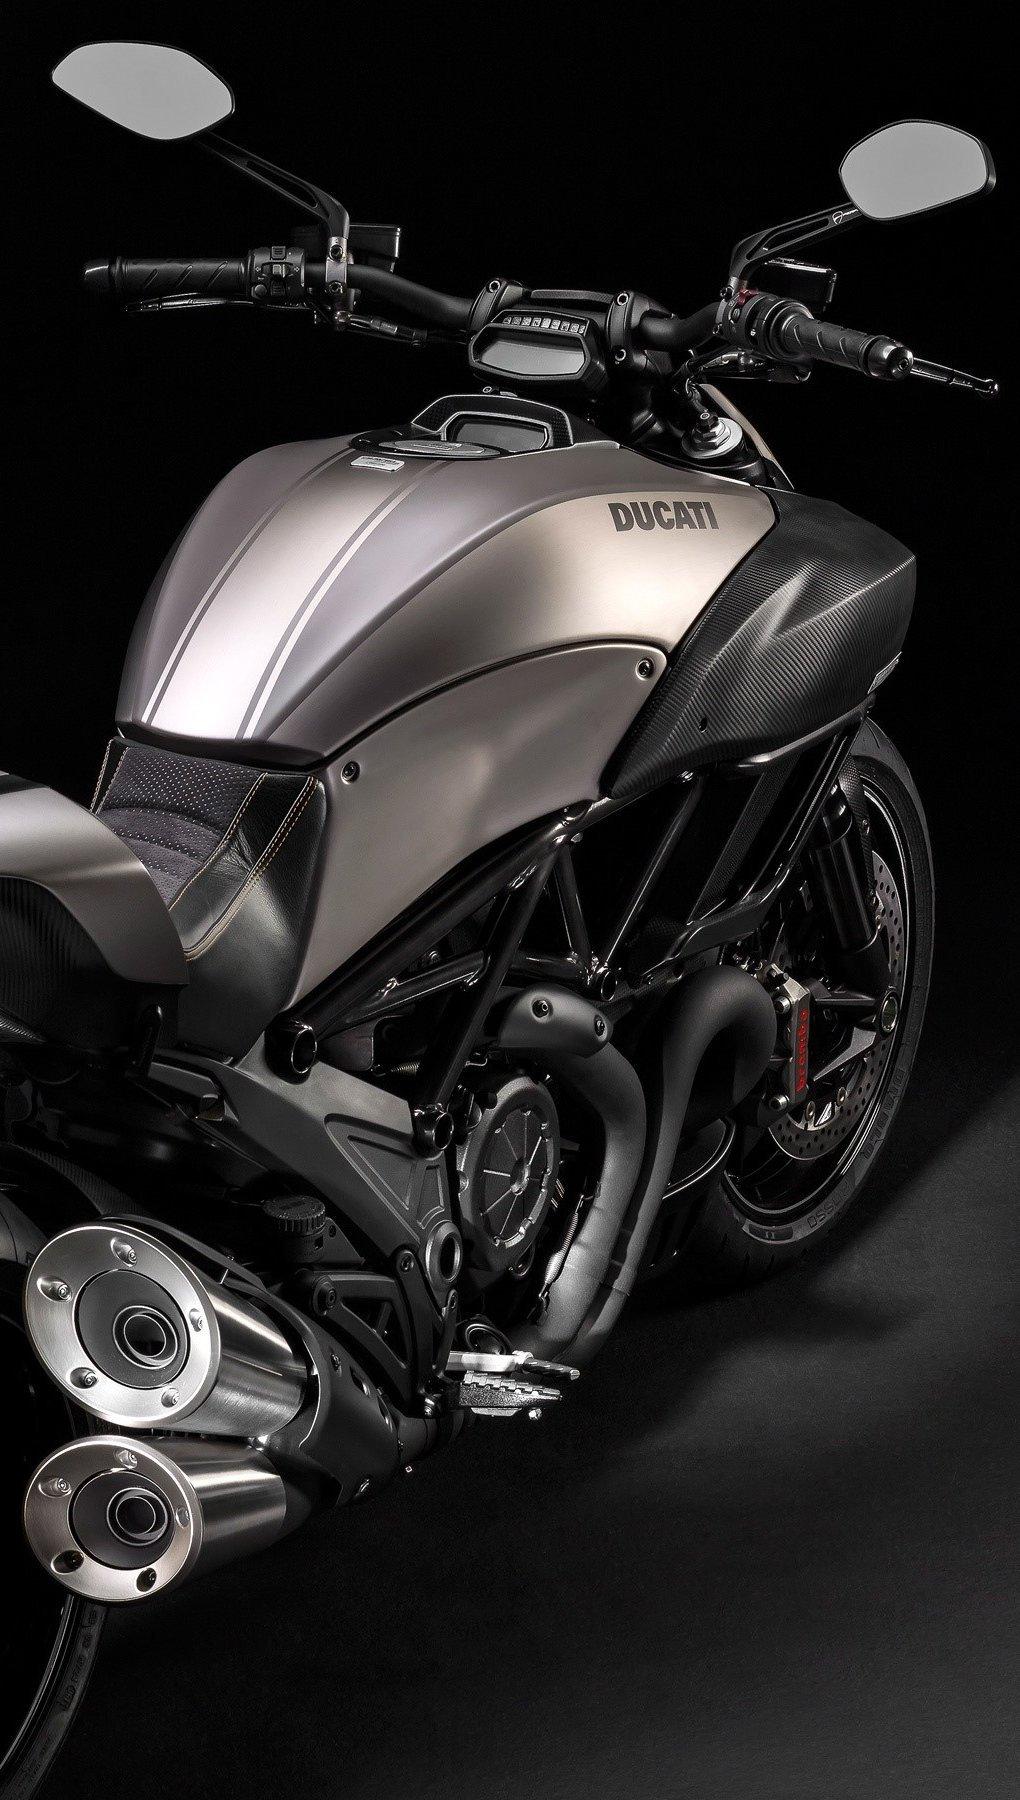 Wallpaper Ducati Diavel Titanium black Vertical